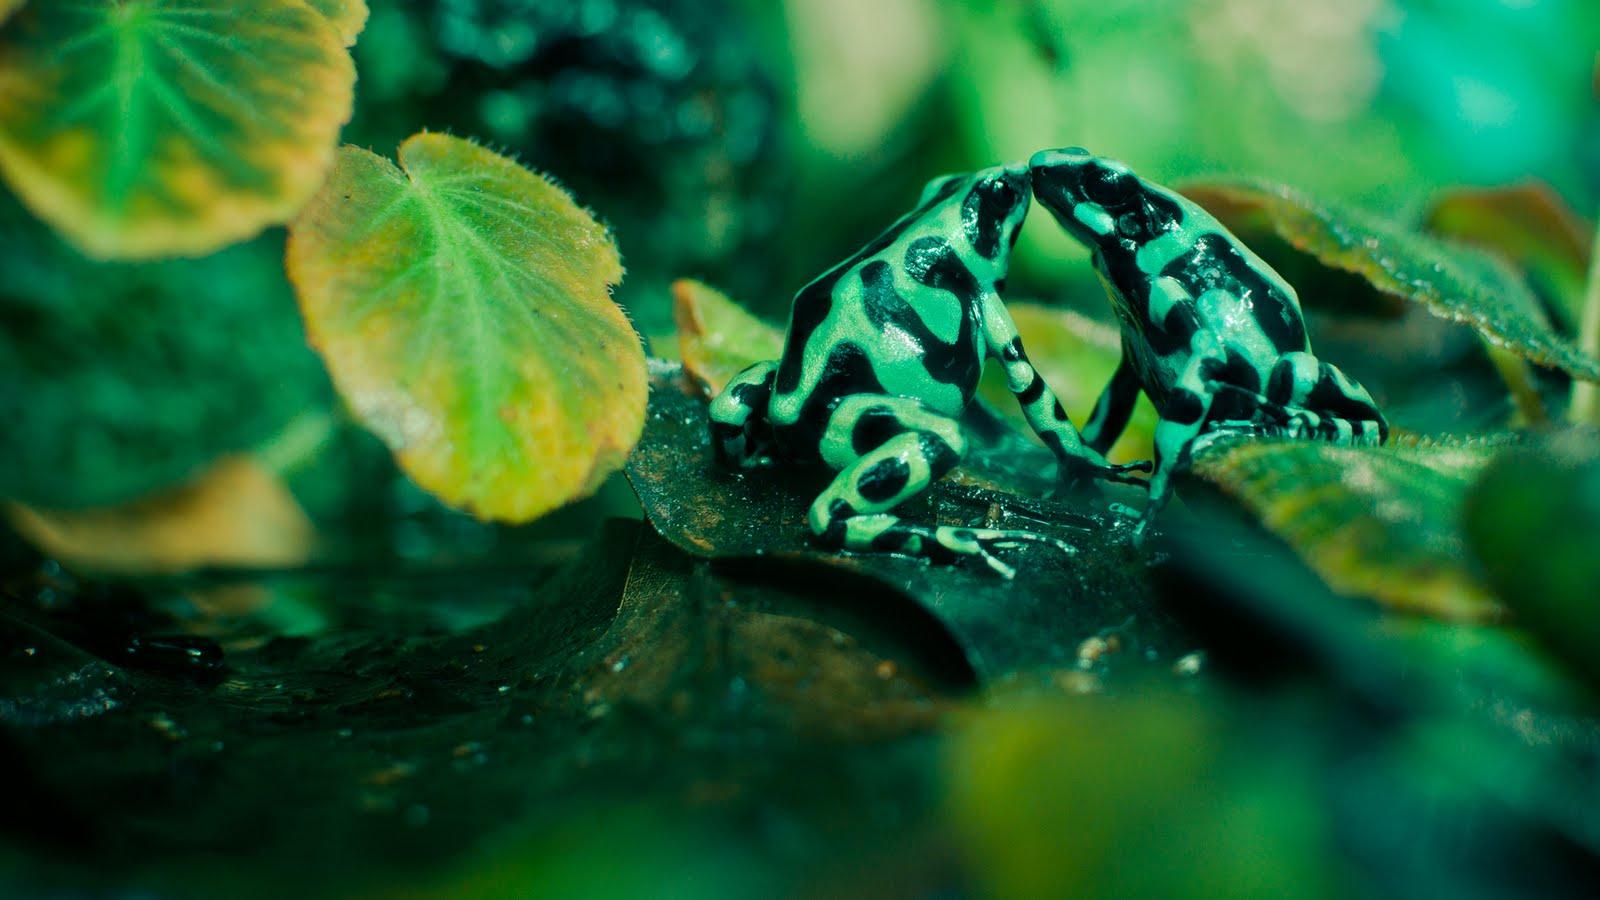 love u wallpapers poison dart frog backgrounds